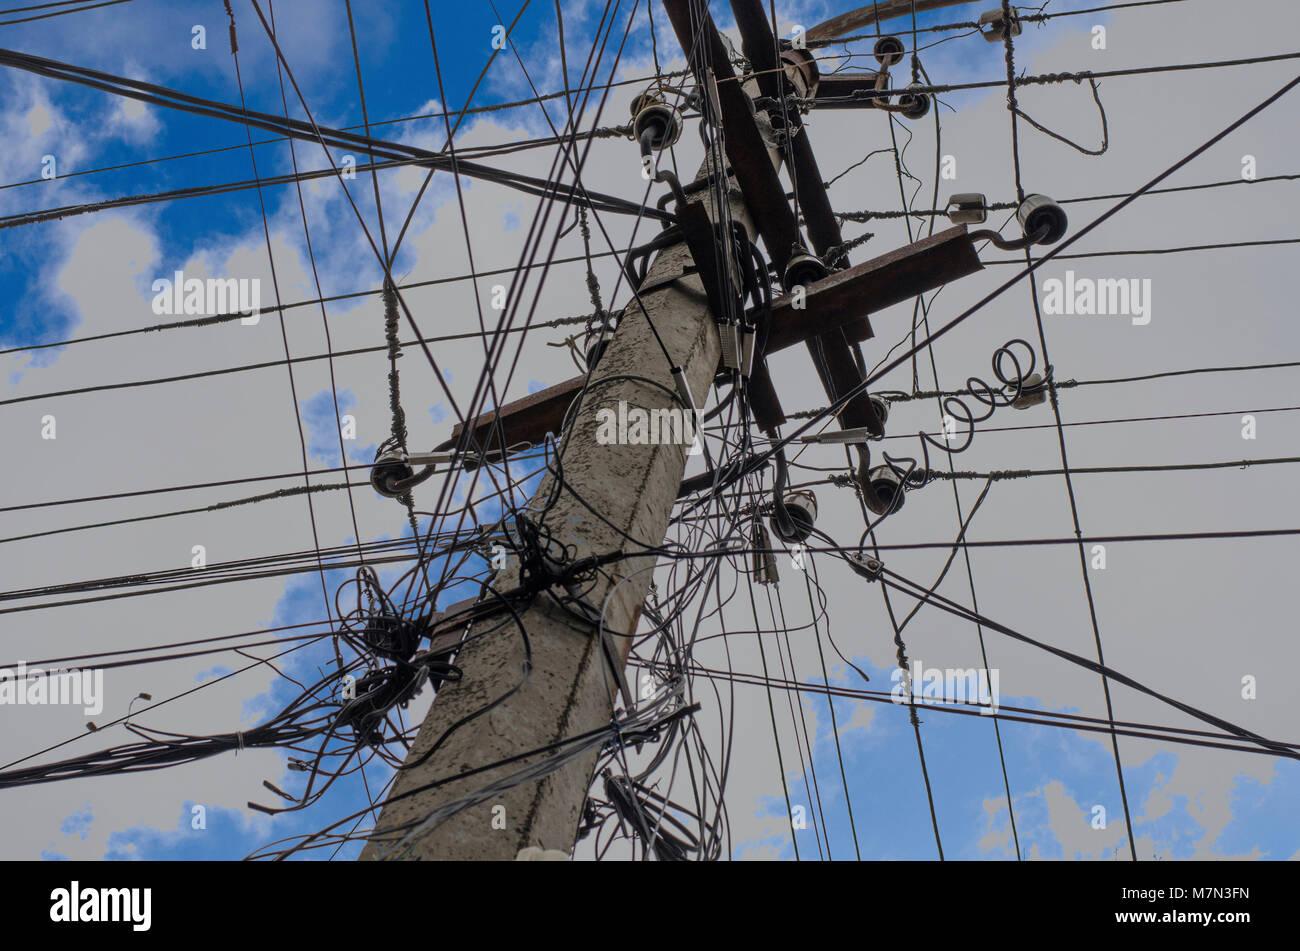 Concrete Electric Pole Stockfotos & Concrete Electric Pole Bilder ...